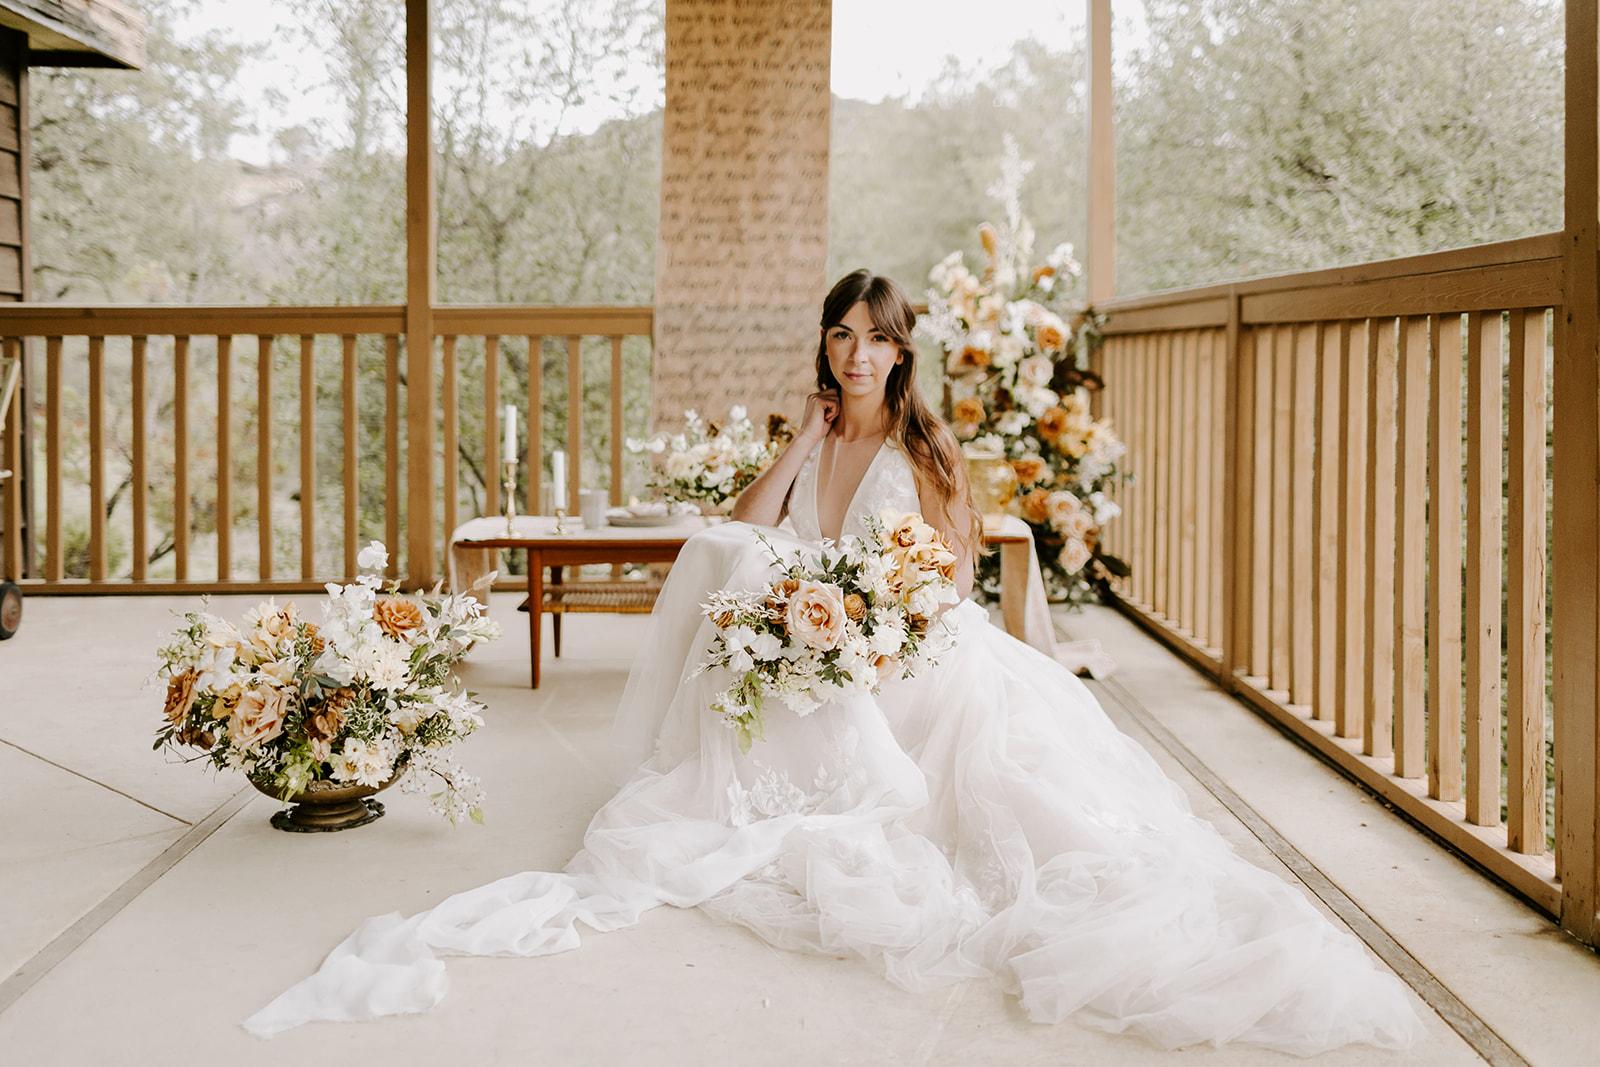 Winter cabin elopement wedding inspiration